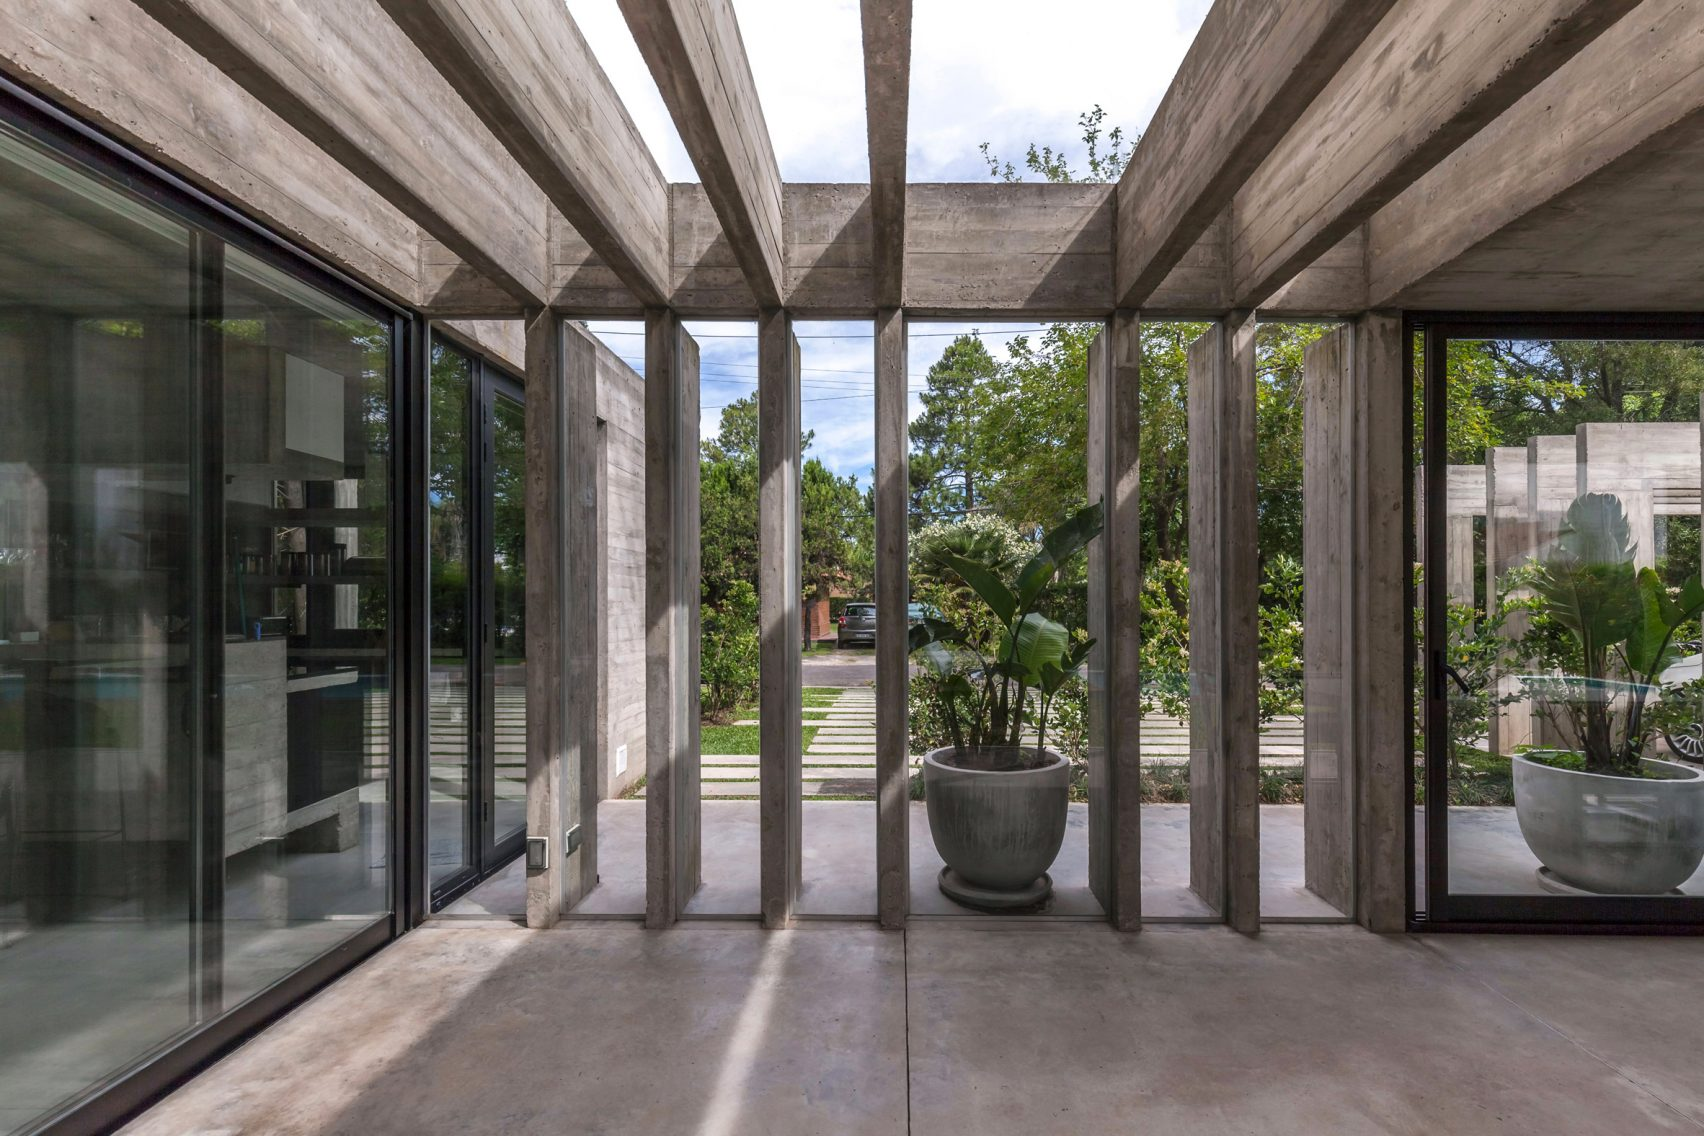 casa-aranzazu-besonias-almeida-arquitectos-architecture-residential-buenos-aires-argentina_dezeen_2364_col_21-1704x1136.jpg